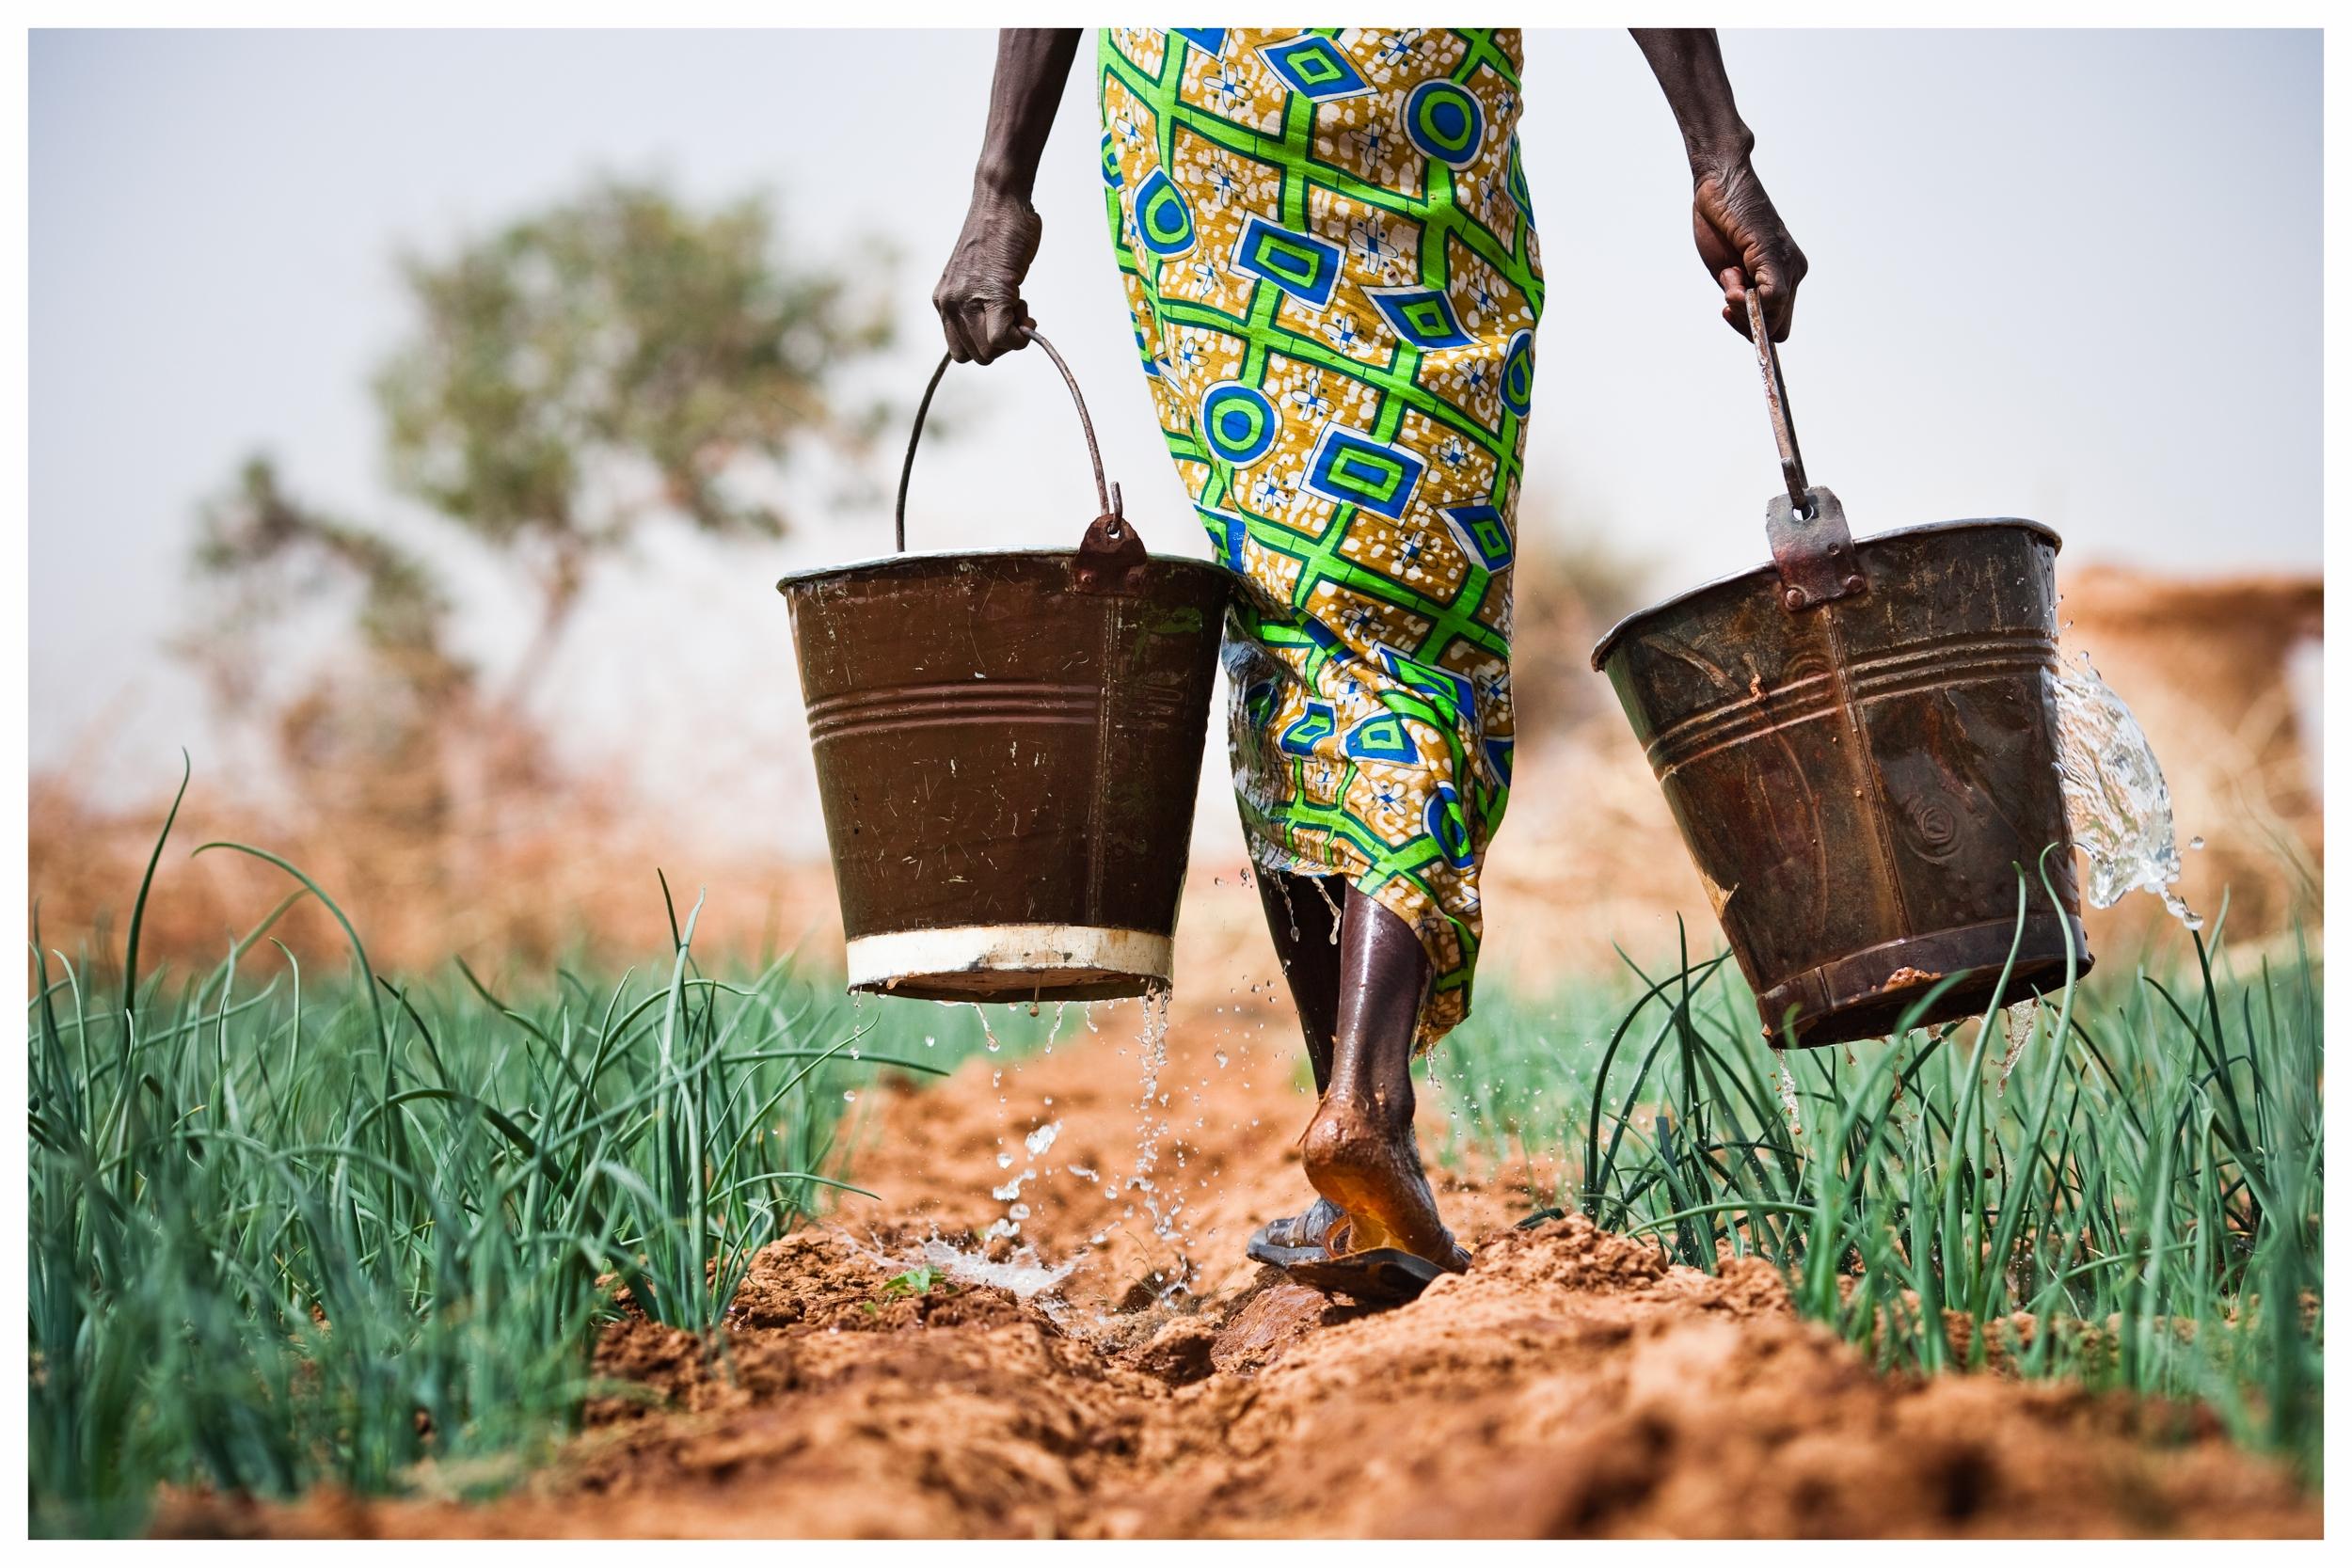 Subsistence farmer carries water for her onions.Kolguinguéssé village, southern Burkina Faso. Photo © Marcus Perkins